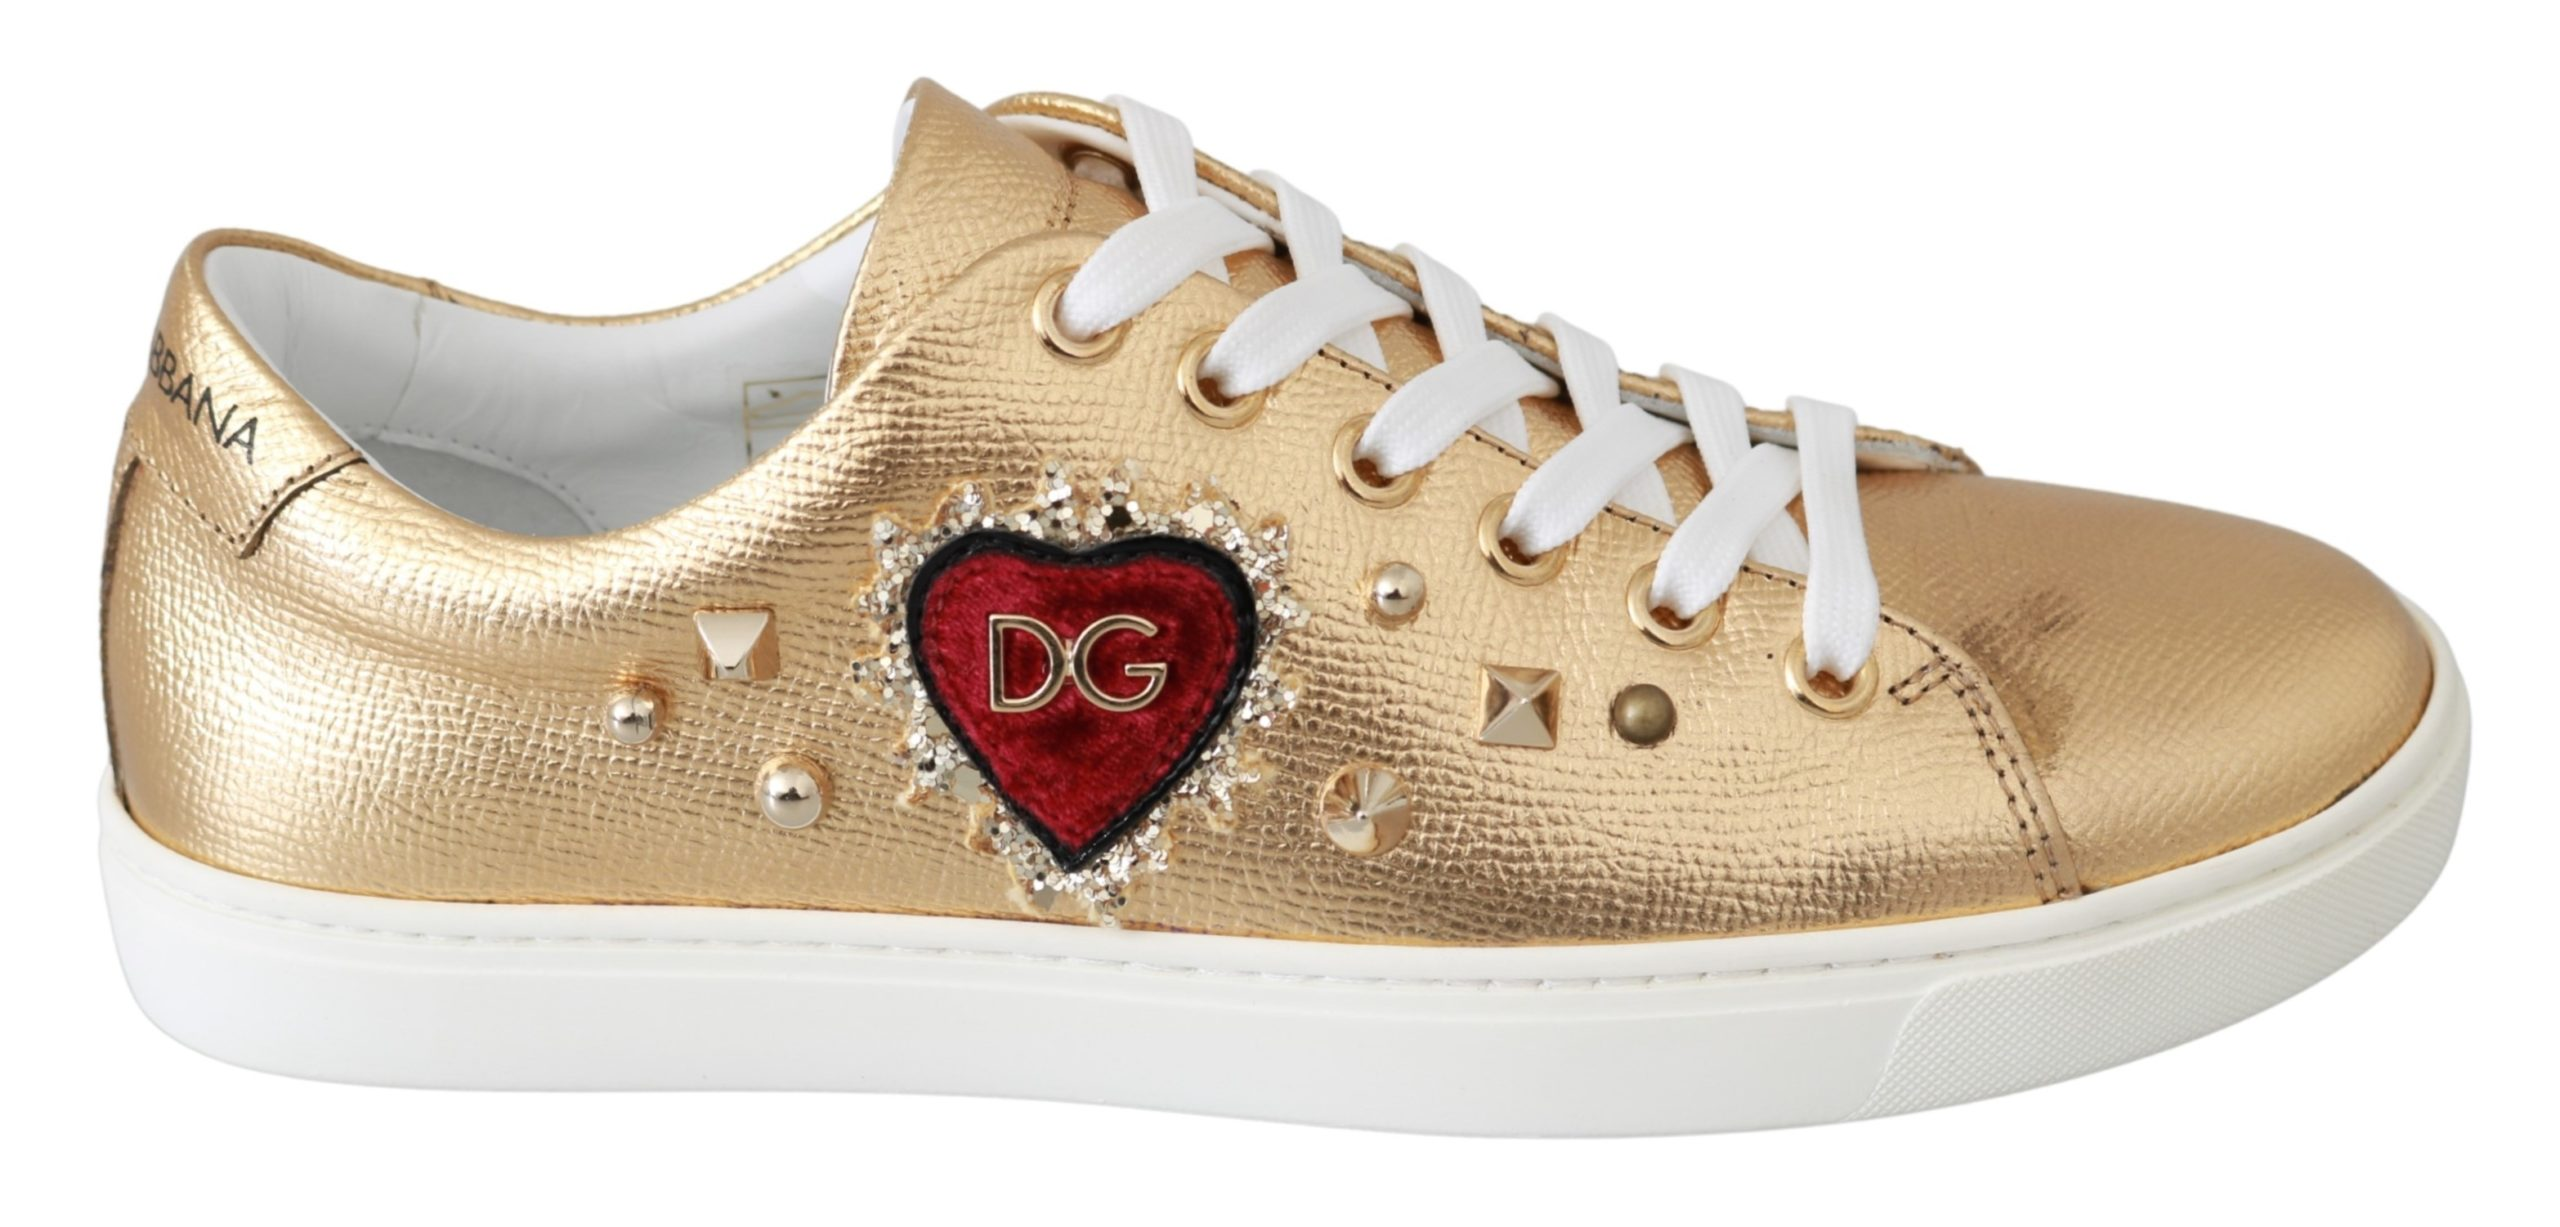 Dolce & Gabbana Women's Leather Heart Trainer Gold LA6479 - EU35.5/US5